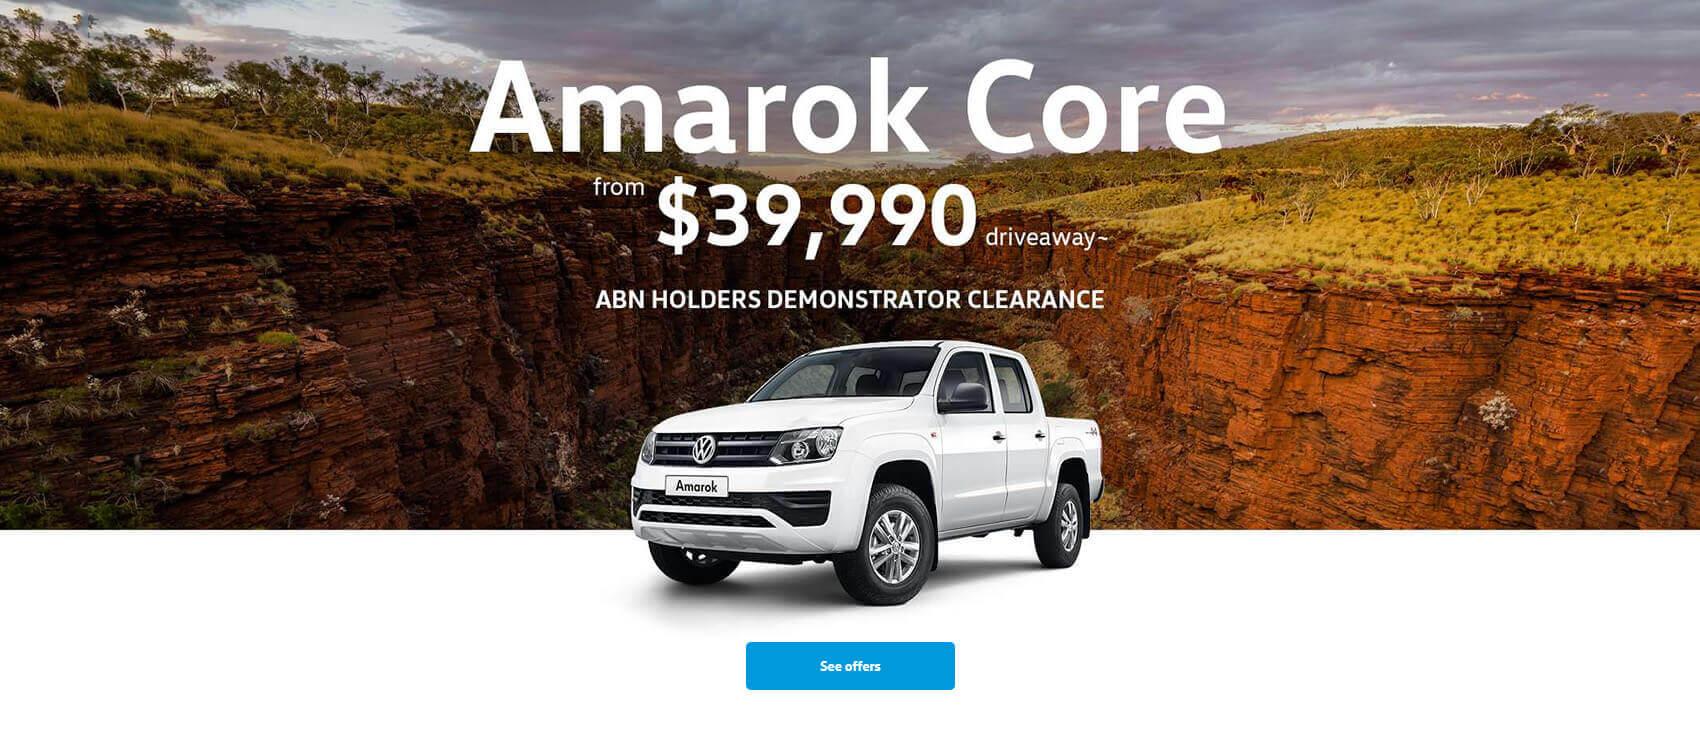 Volkswagen Amarok Core ABN Holders Demonstrator Clearance.